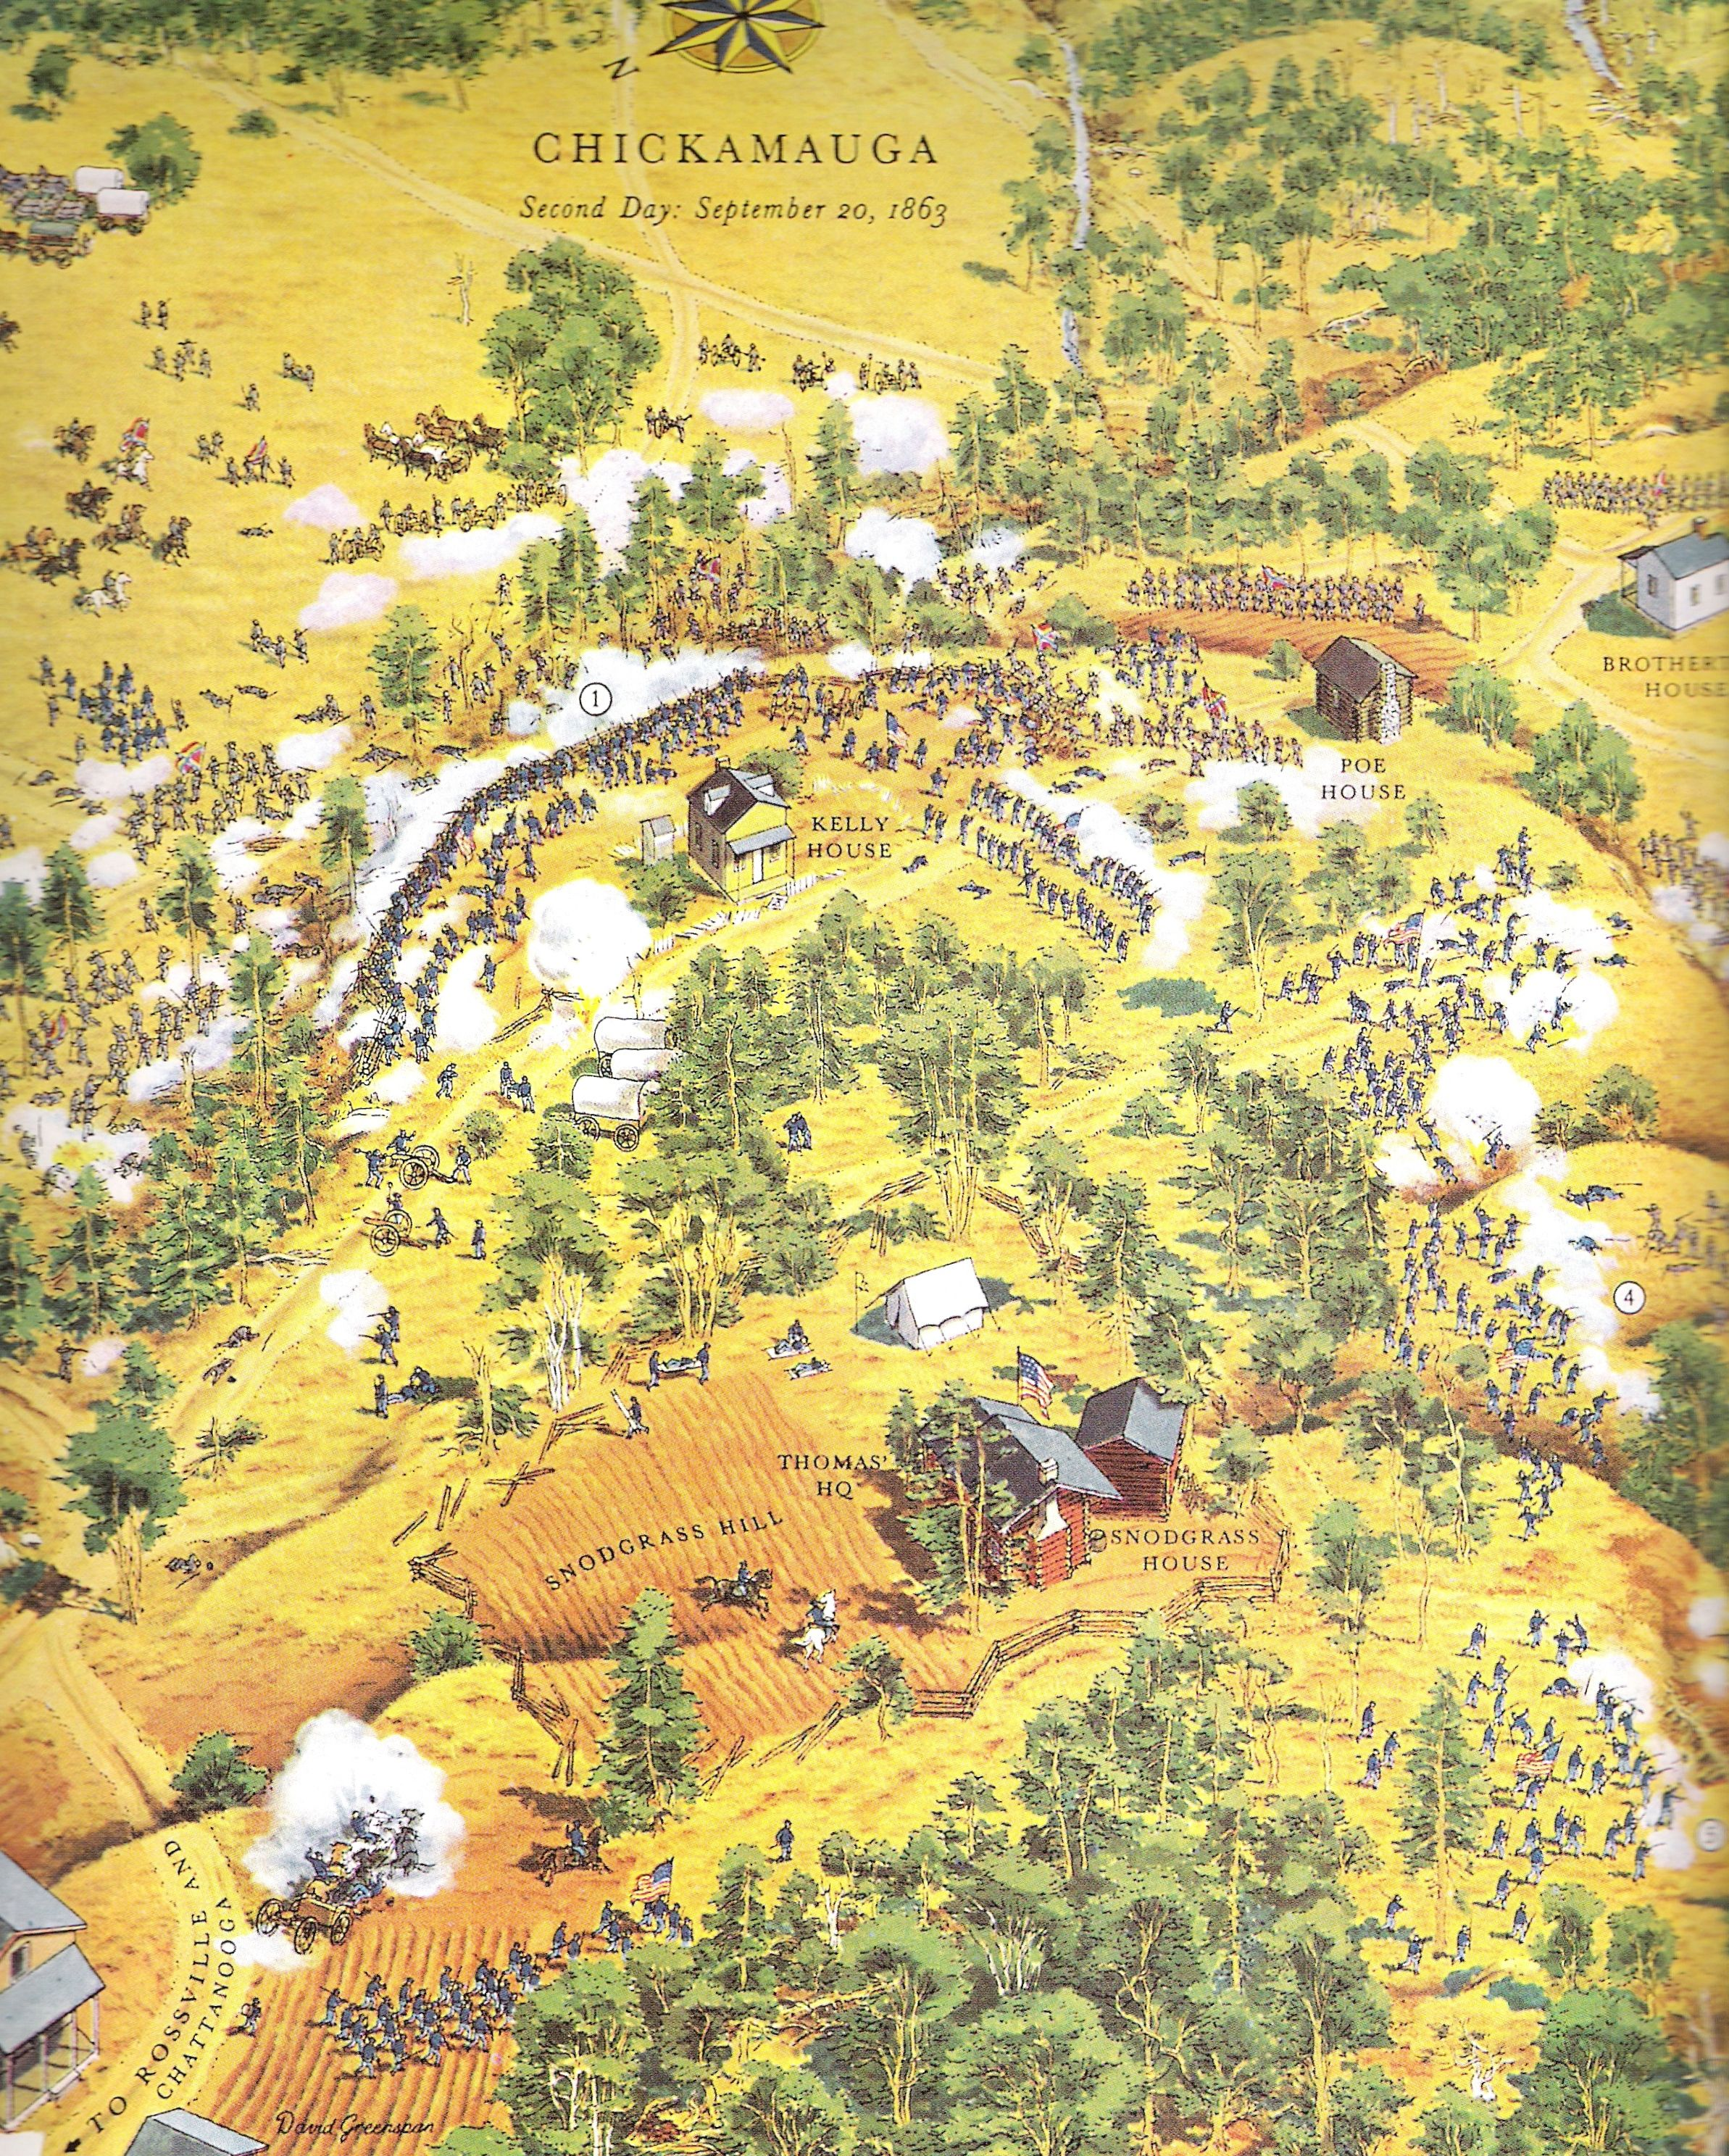 The Civil War Maps Of David Greenspan Civil Wars American Civil - Chickamauga on us map